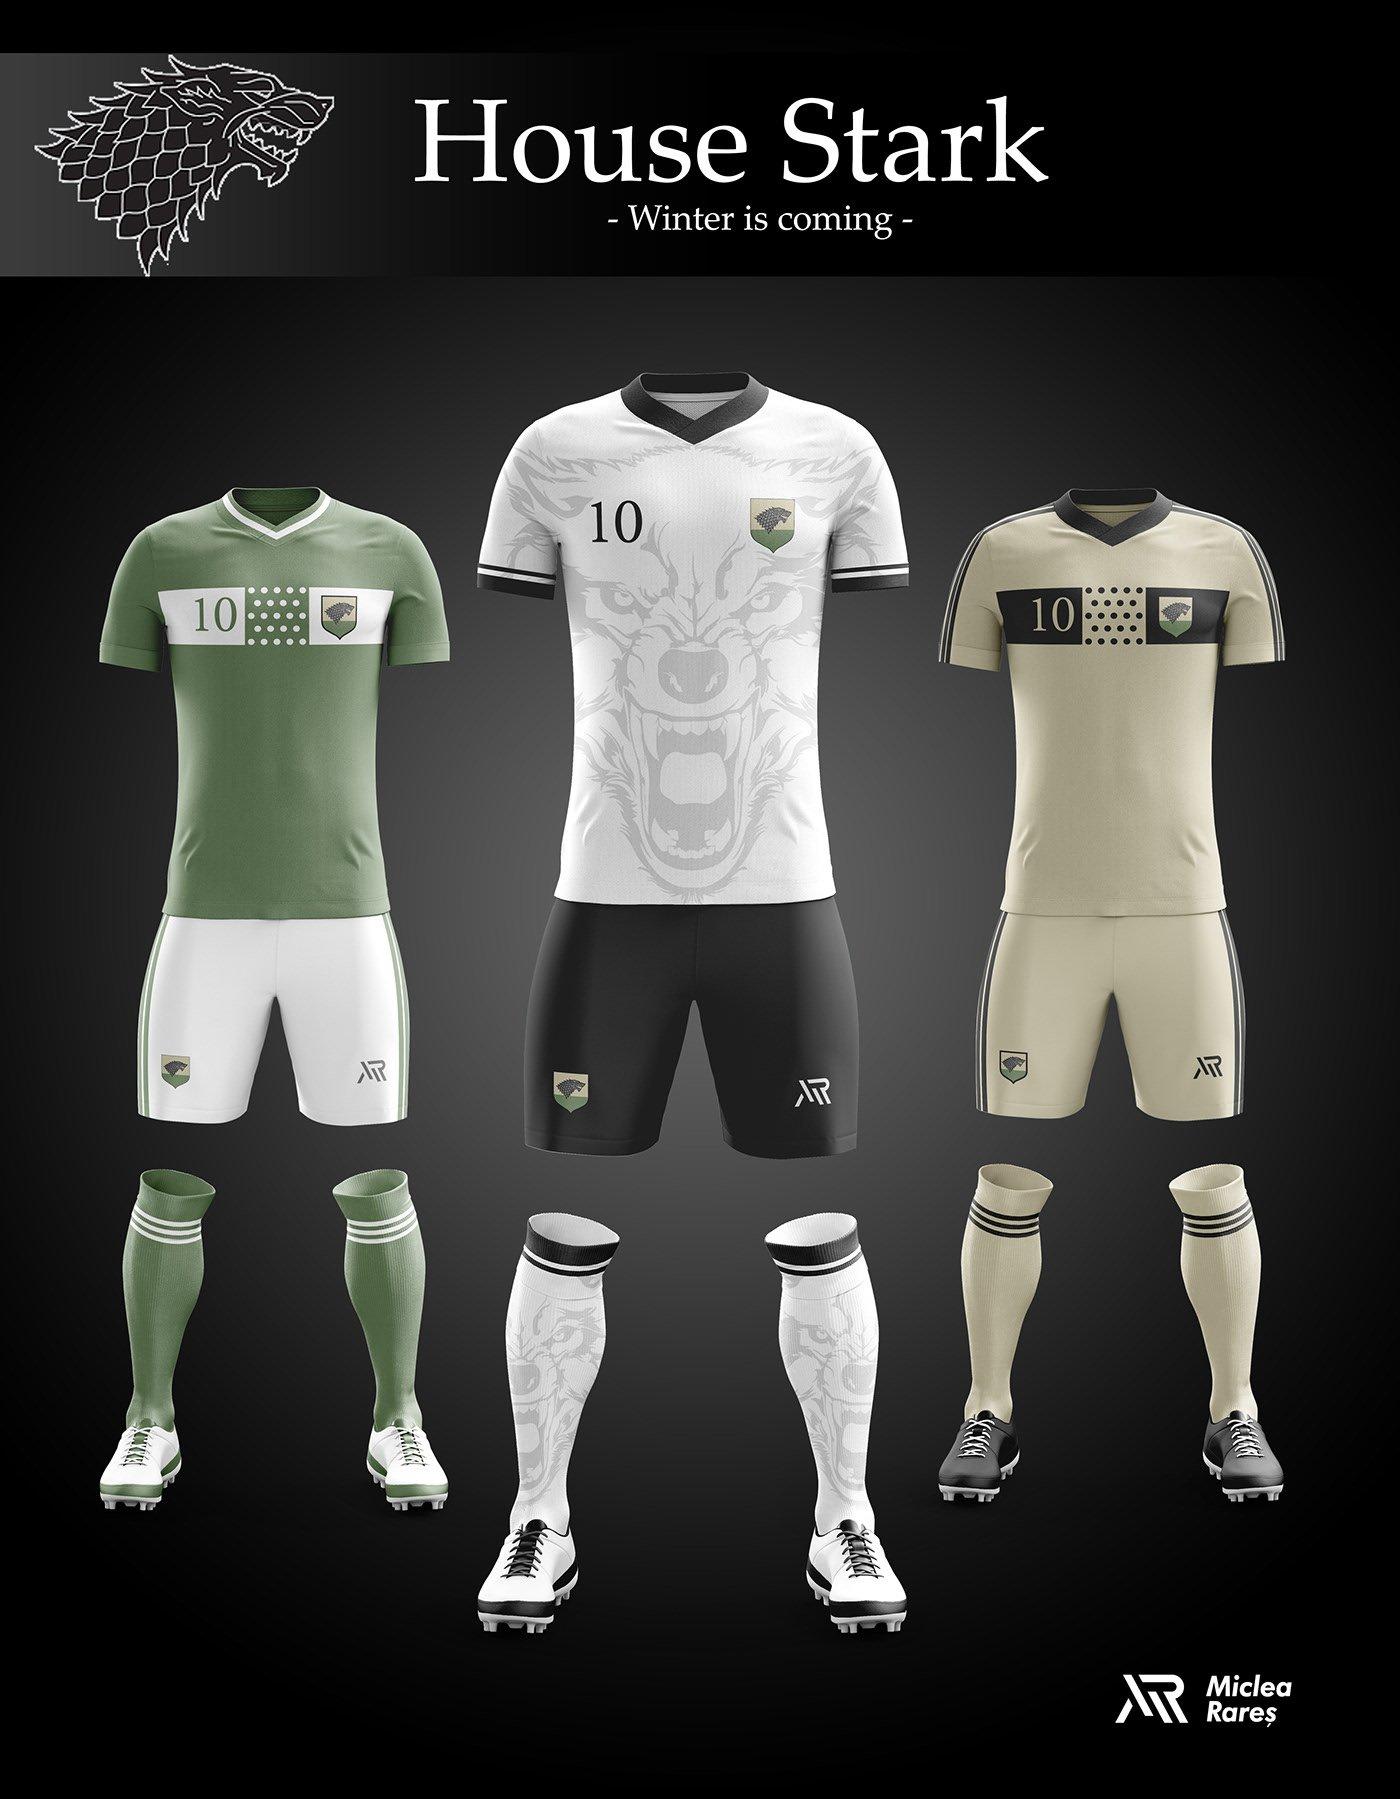 House Stark Football Kit